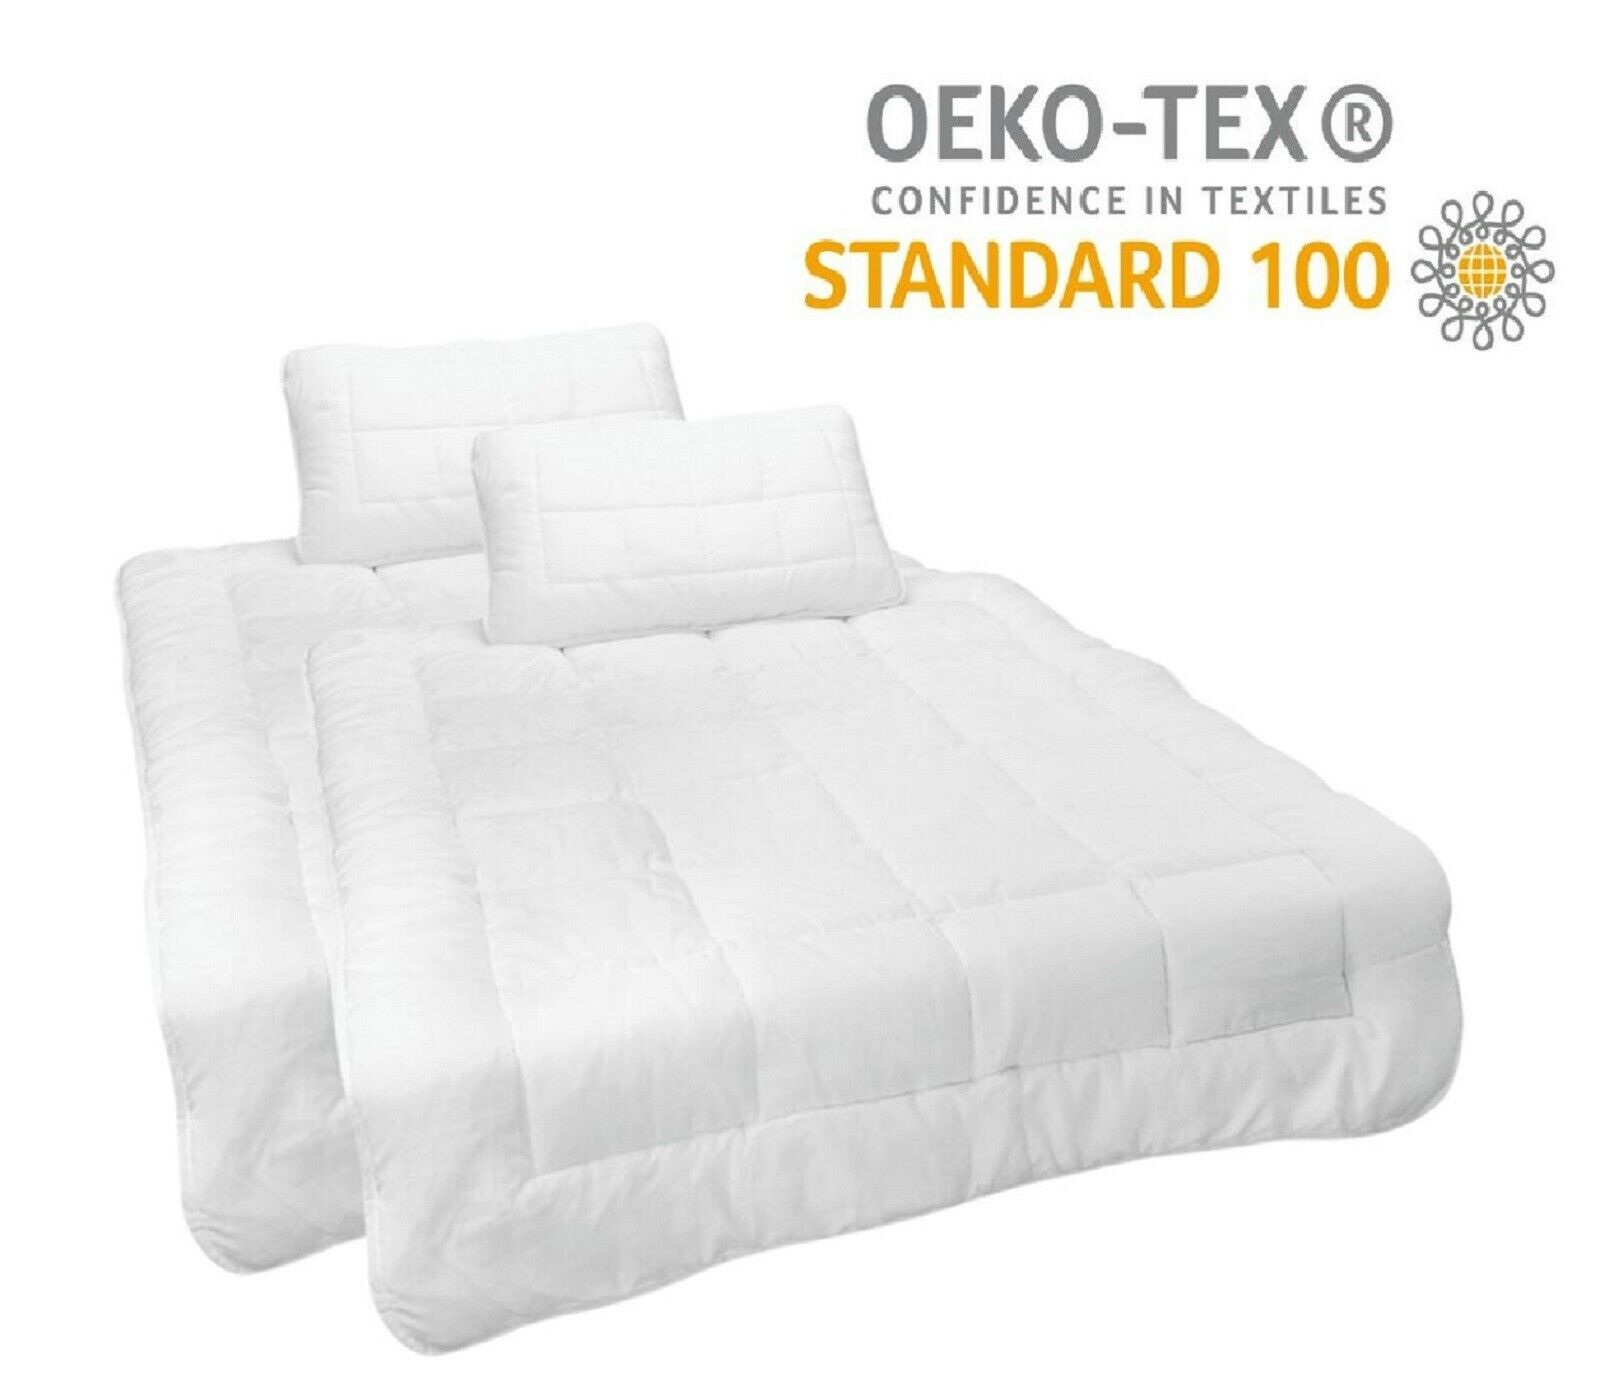 2x Kinder / Baby Bettdecke 100x135 Set + Kissen 40x60 Steppbett Decke Kopfkissen